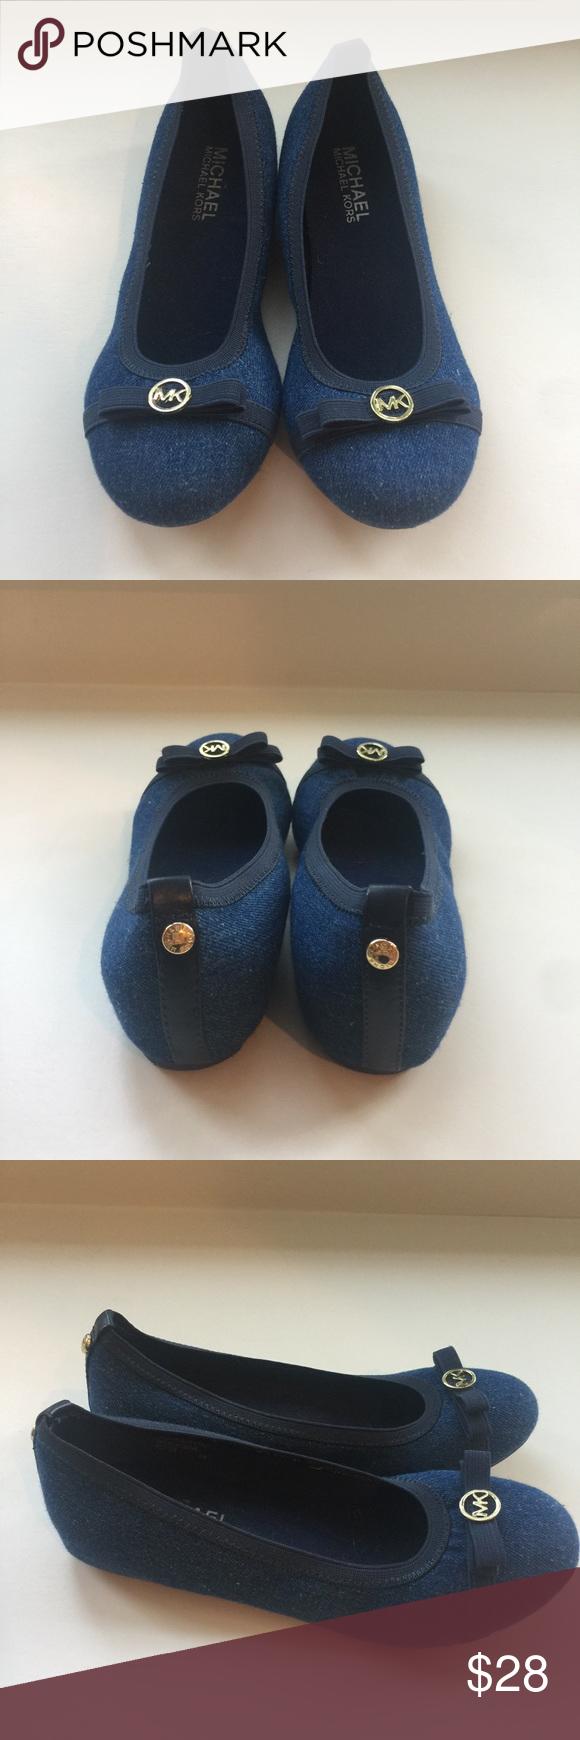 Michael Kors size 2 denim flats Michael Kors size 2 denim flats. In EUC. Michael Kors Shoes